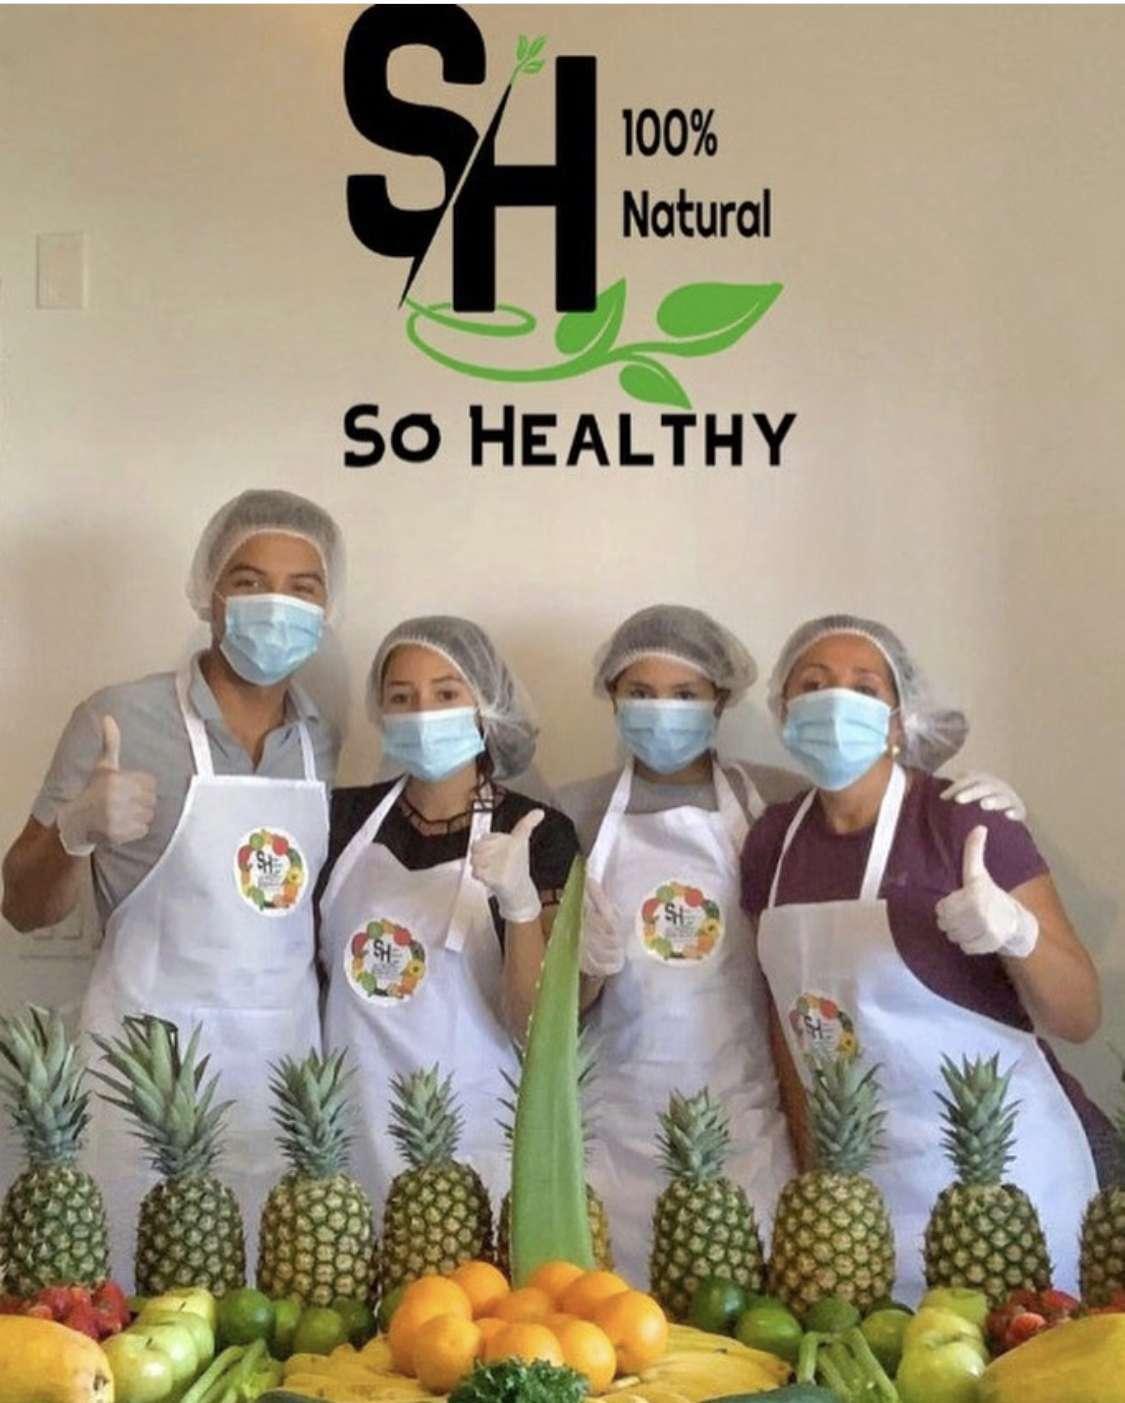 Familia So Healthy